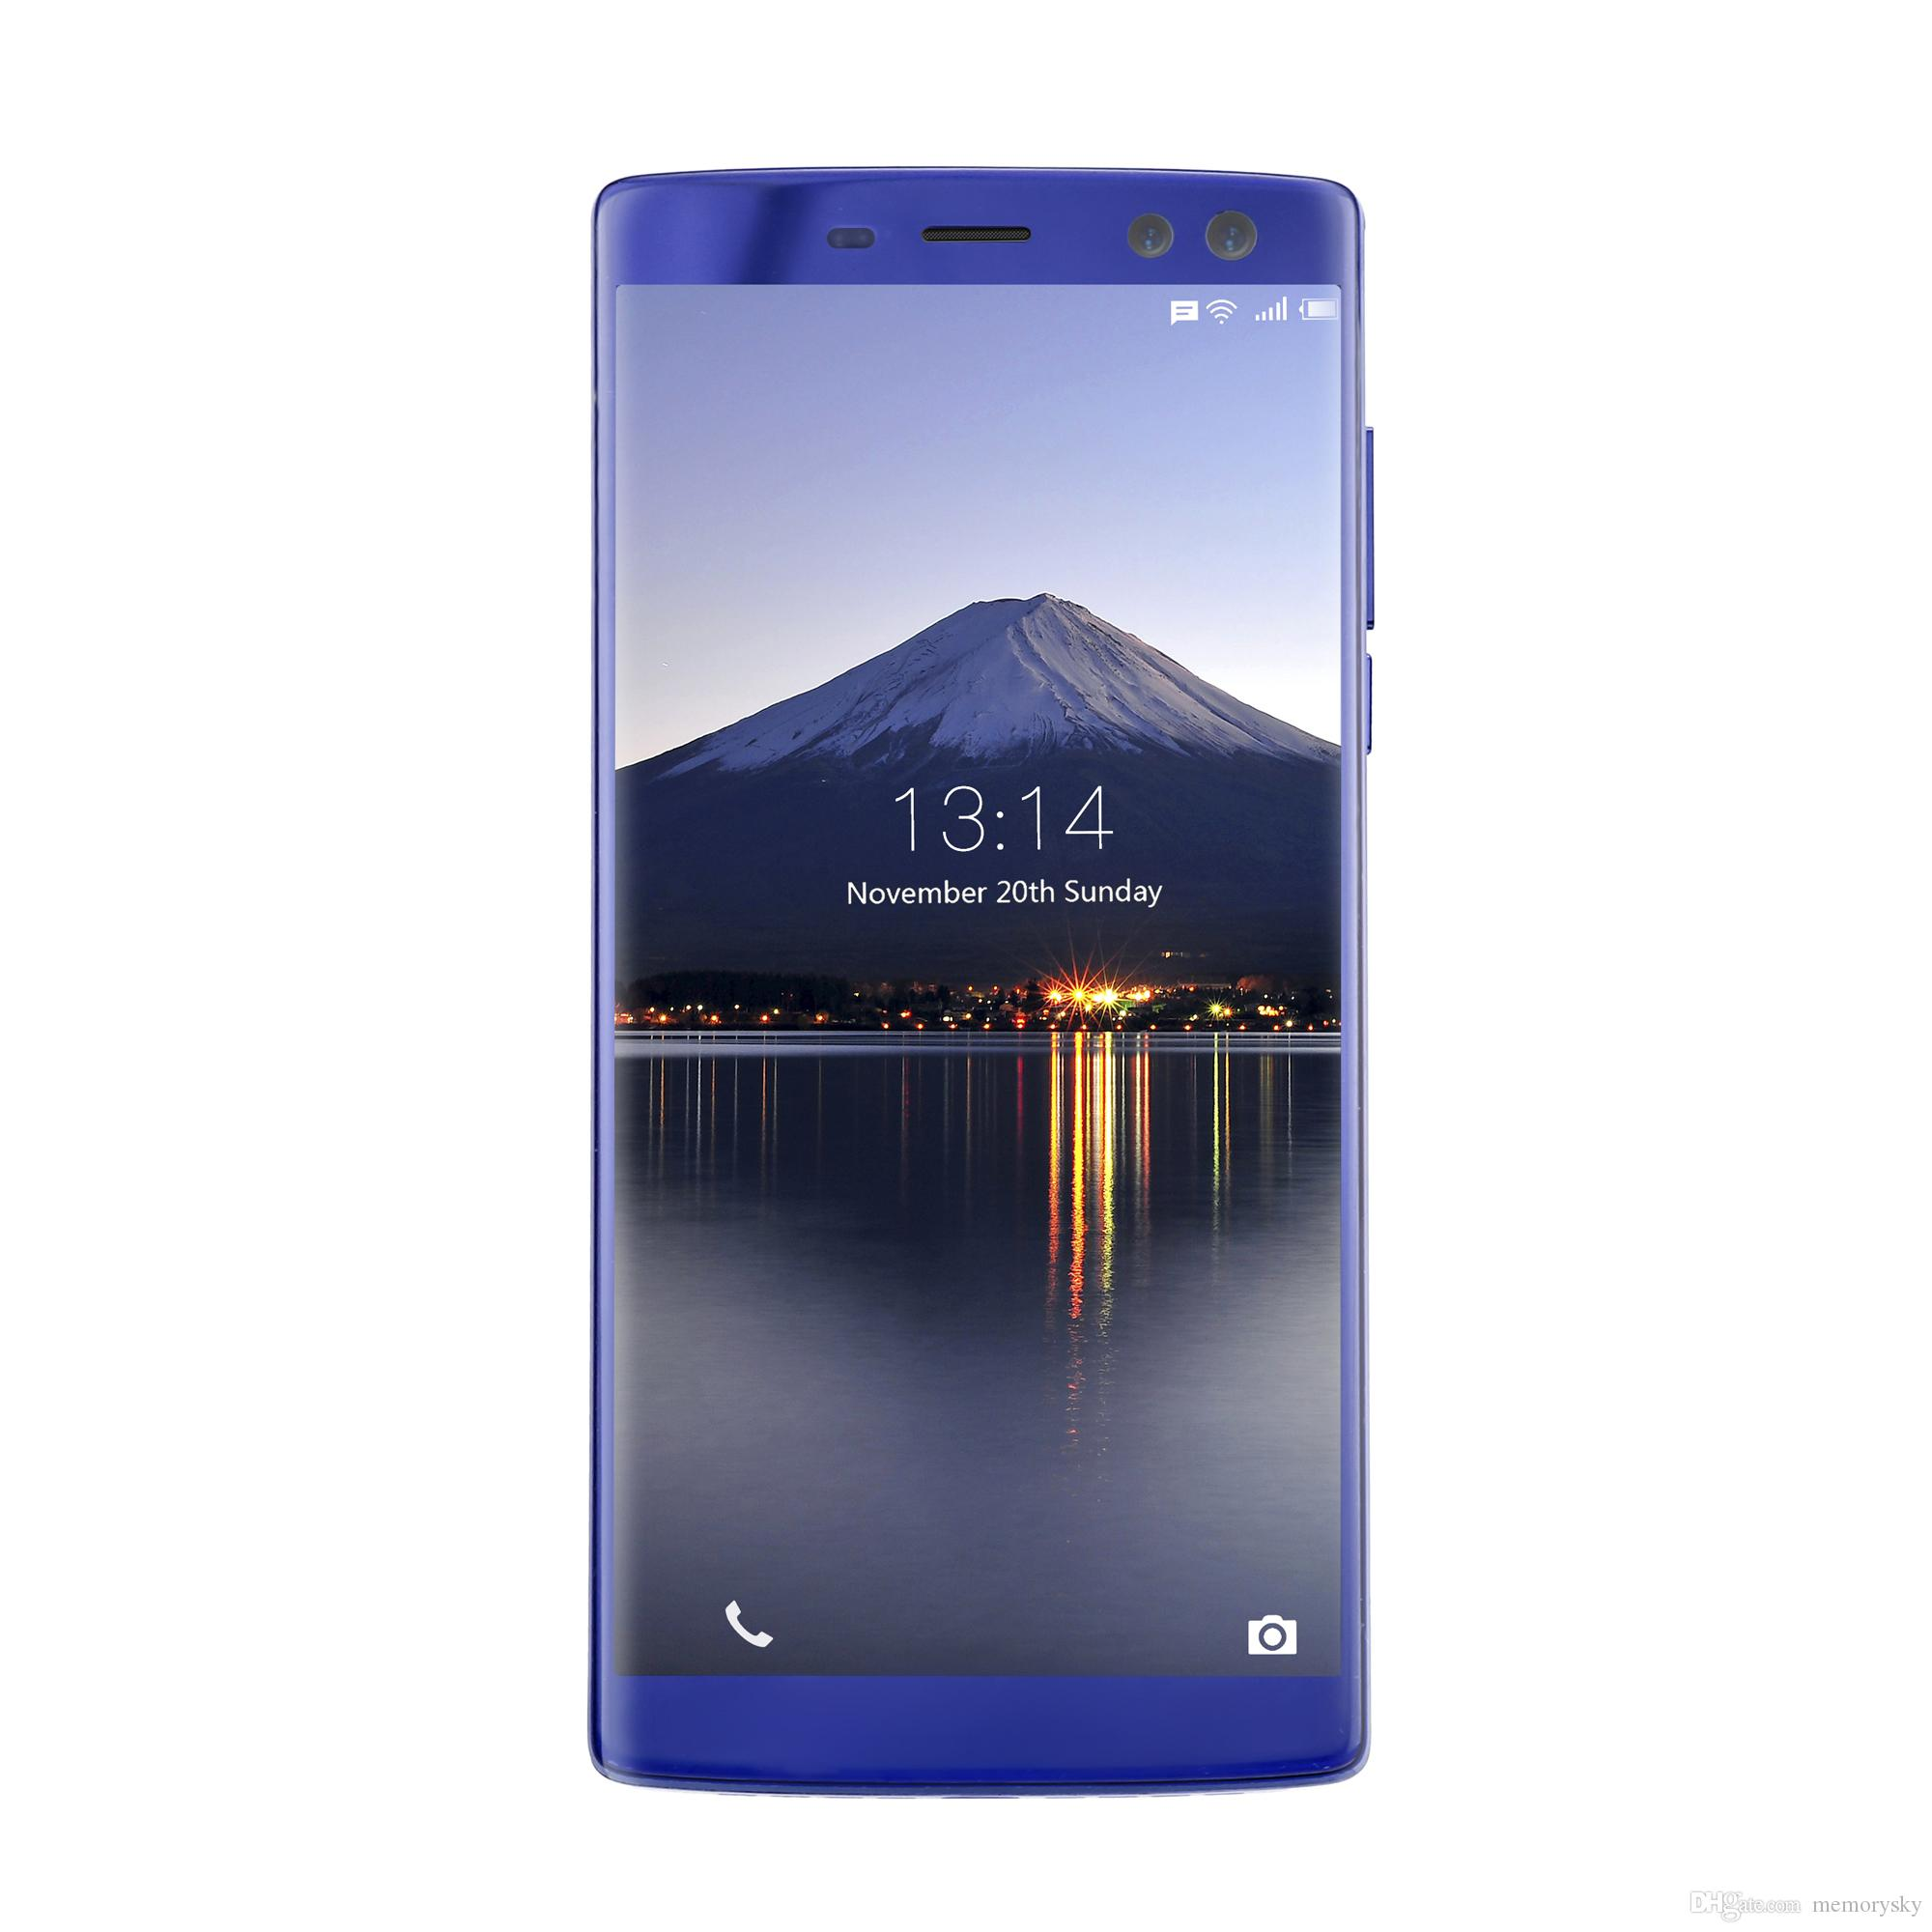 Smartphone Ohne Vertrag Doogee Bl Pro Octacore 6 Gb Ram 64 Gb Rom Android 7 0 Fingerabdruck 4g Dual Sim 6 0 Handy großhandel Günstige Smartphones Ohne